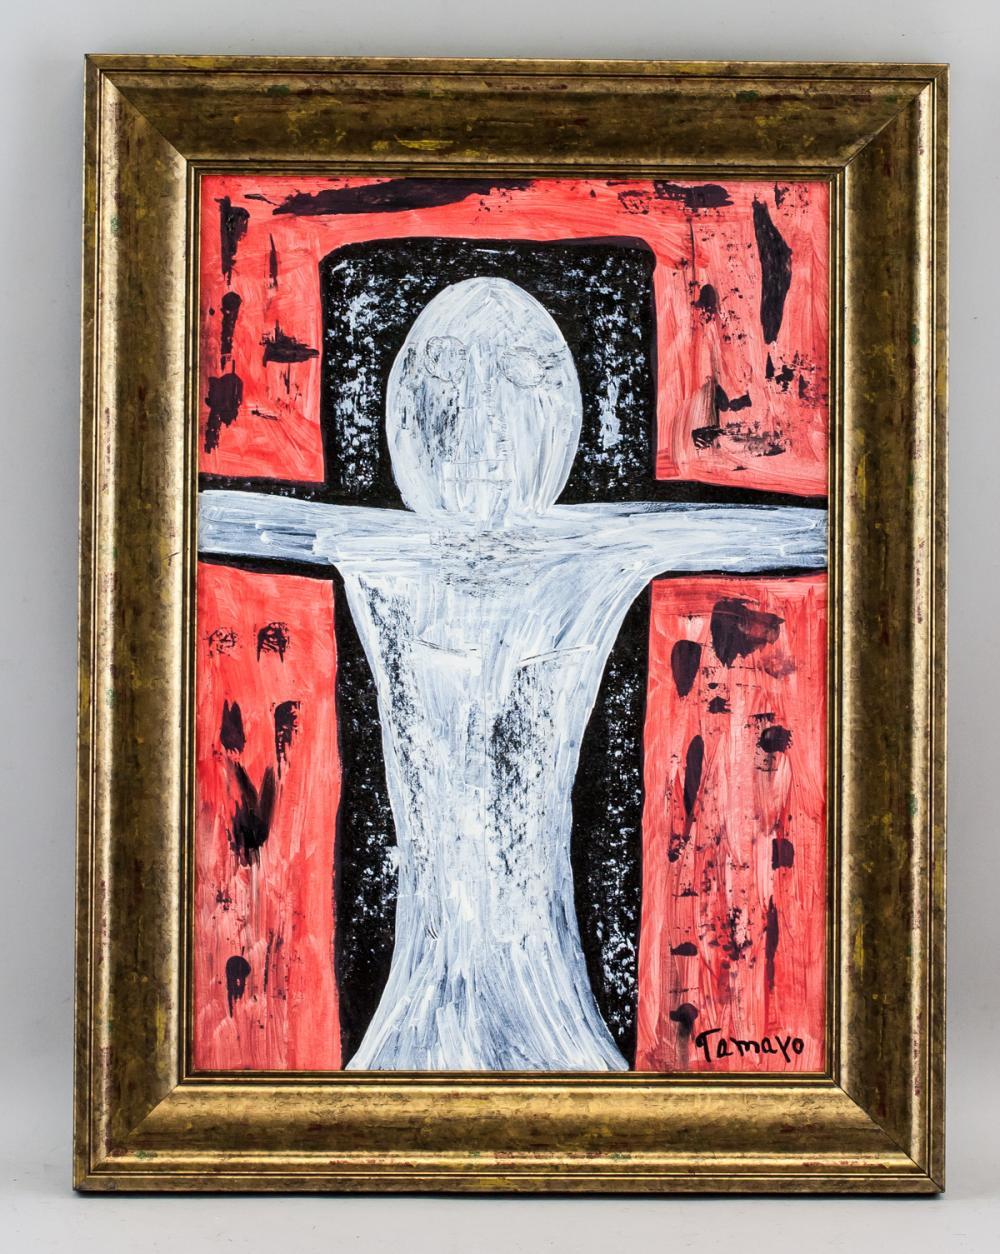 Lot 189: Rufino Tamayo Mexican Surrealist Oil on Canvas